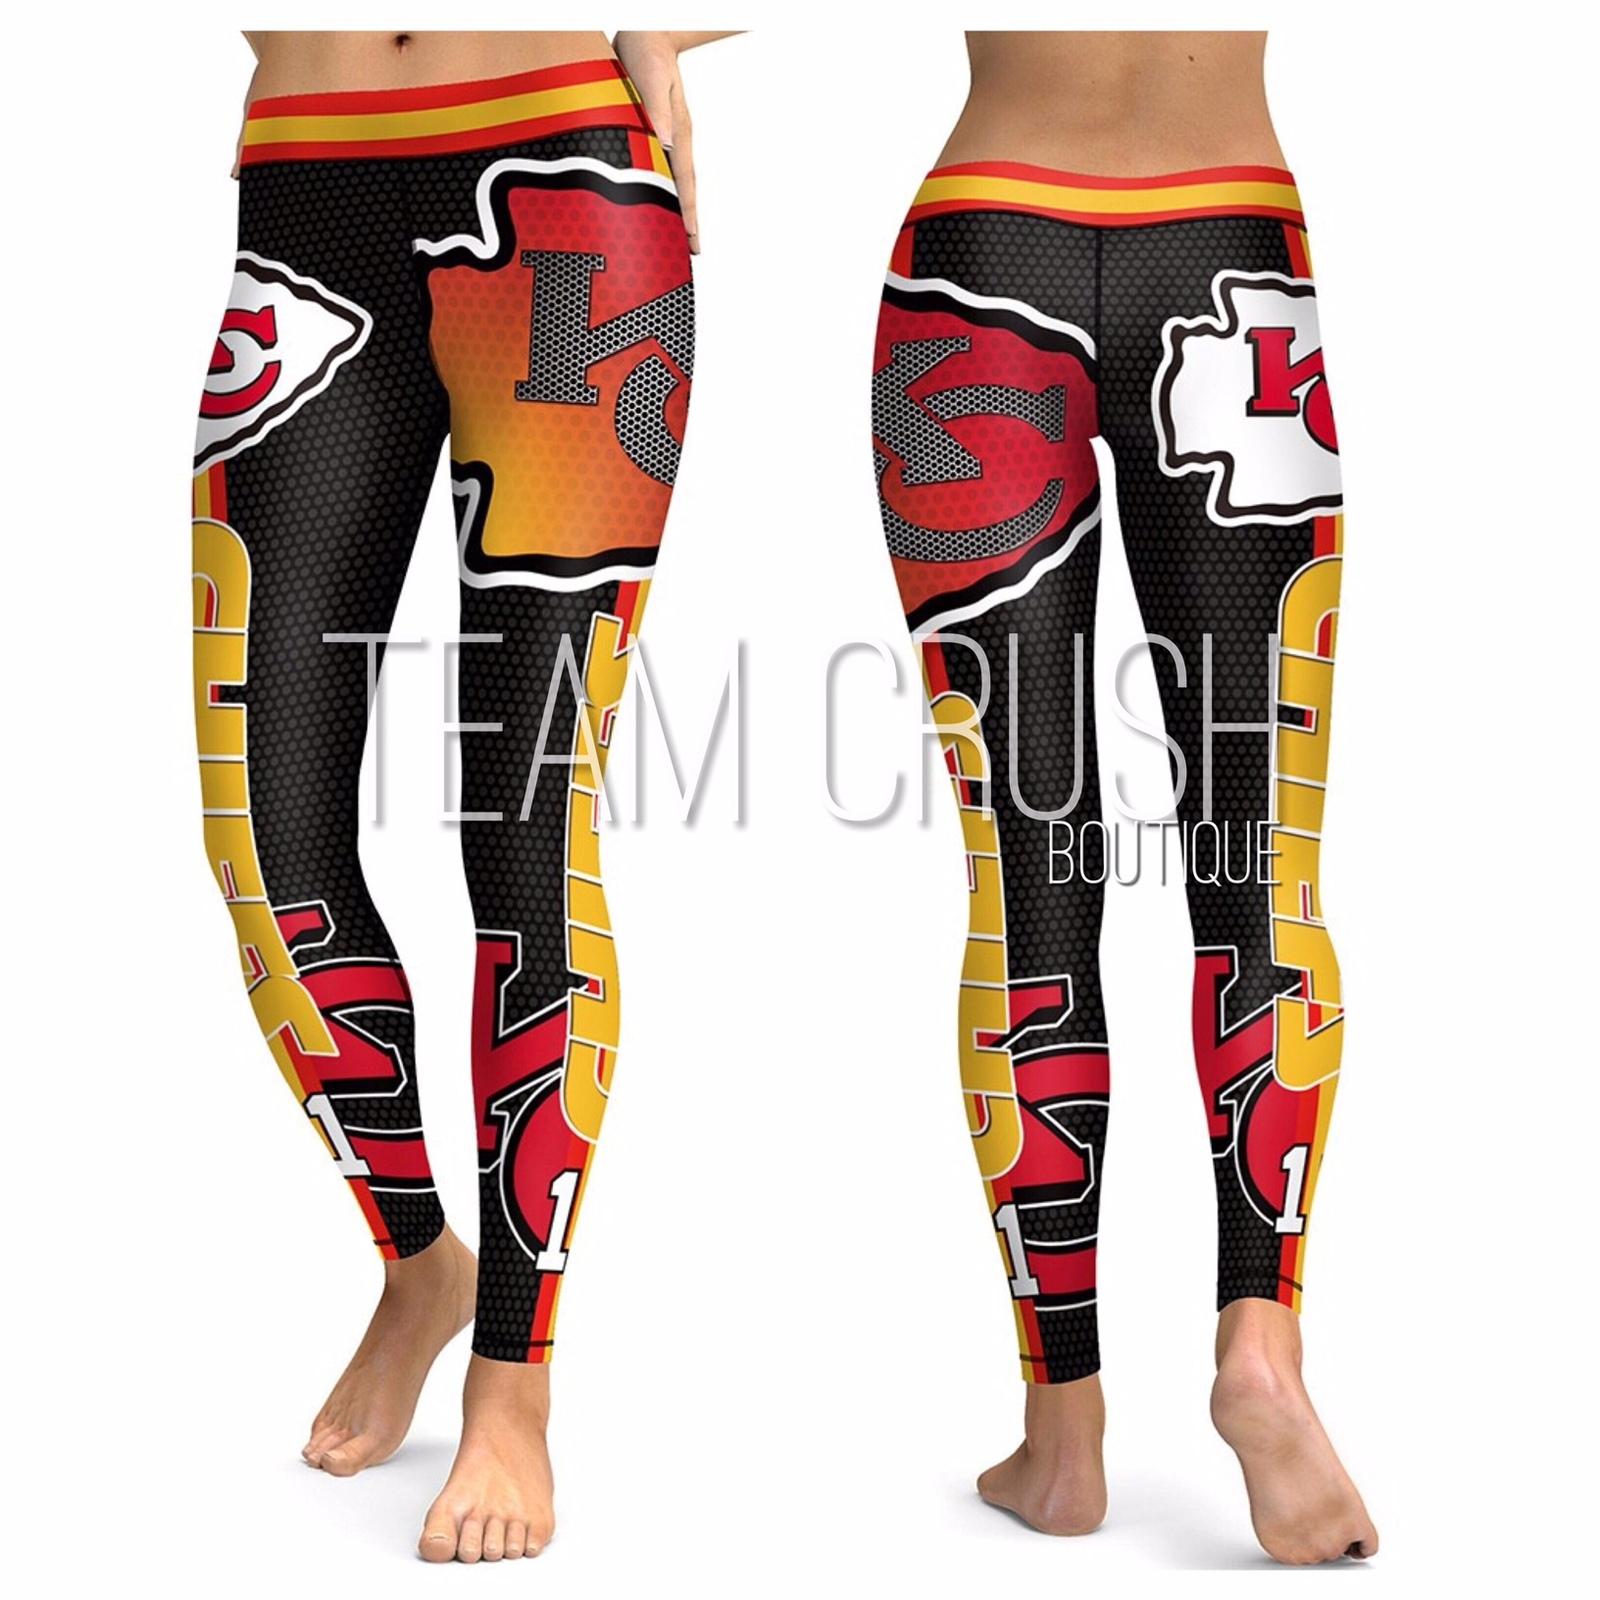 newest a5339 1f43b KC CHIEFS Leggings - #11 Women Fan Gear - and 50 similar items